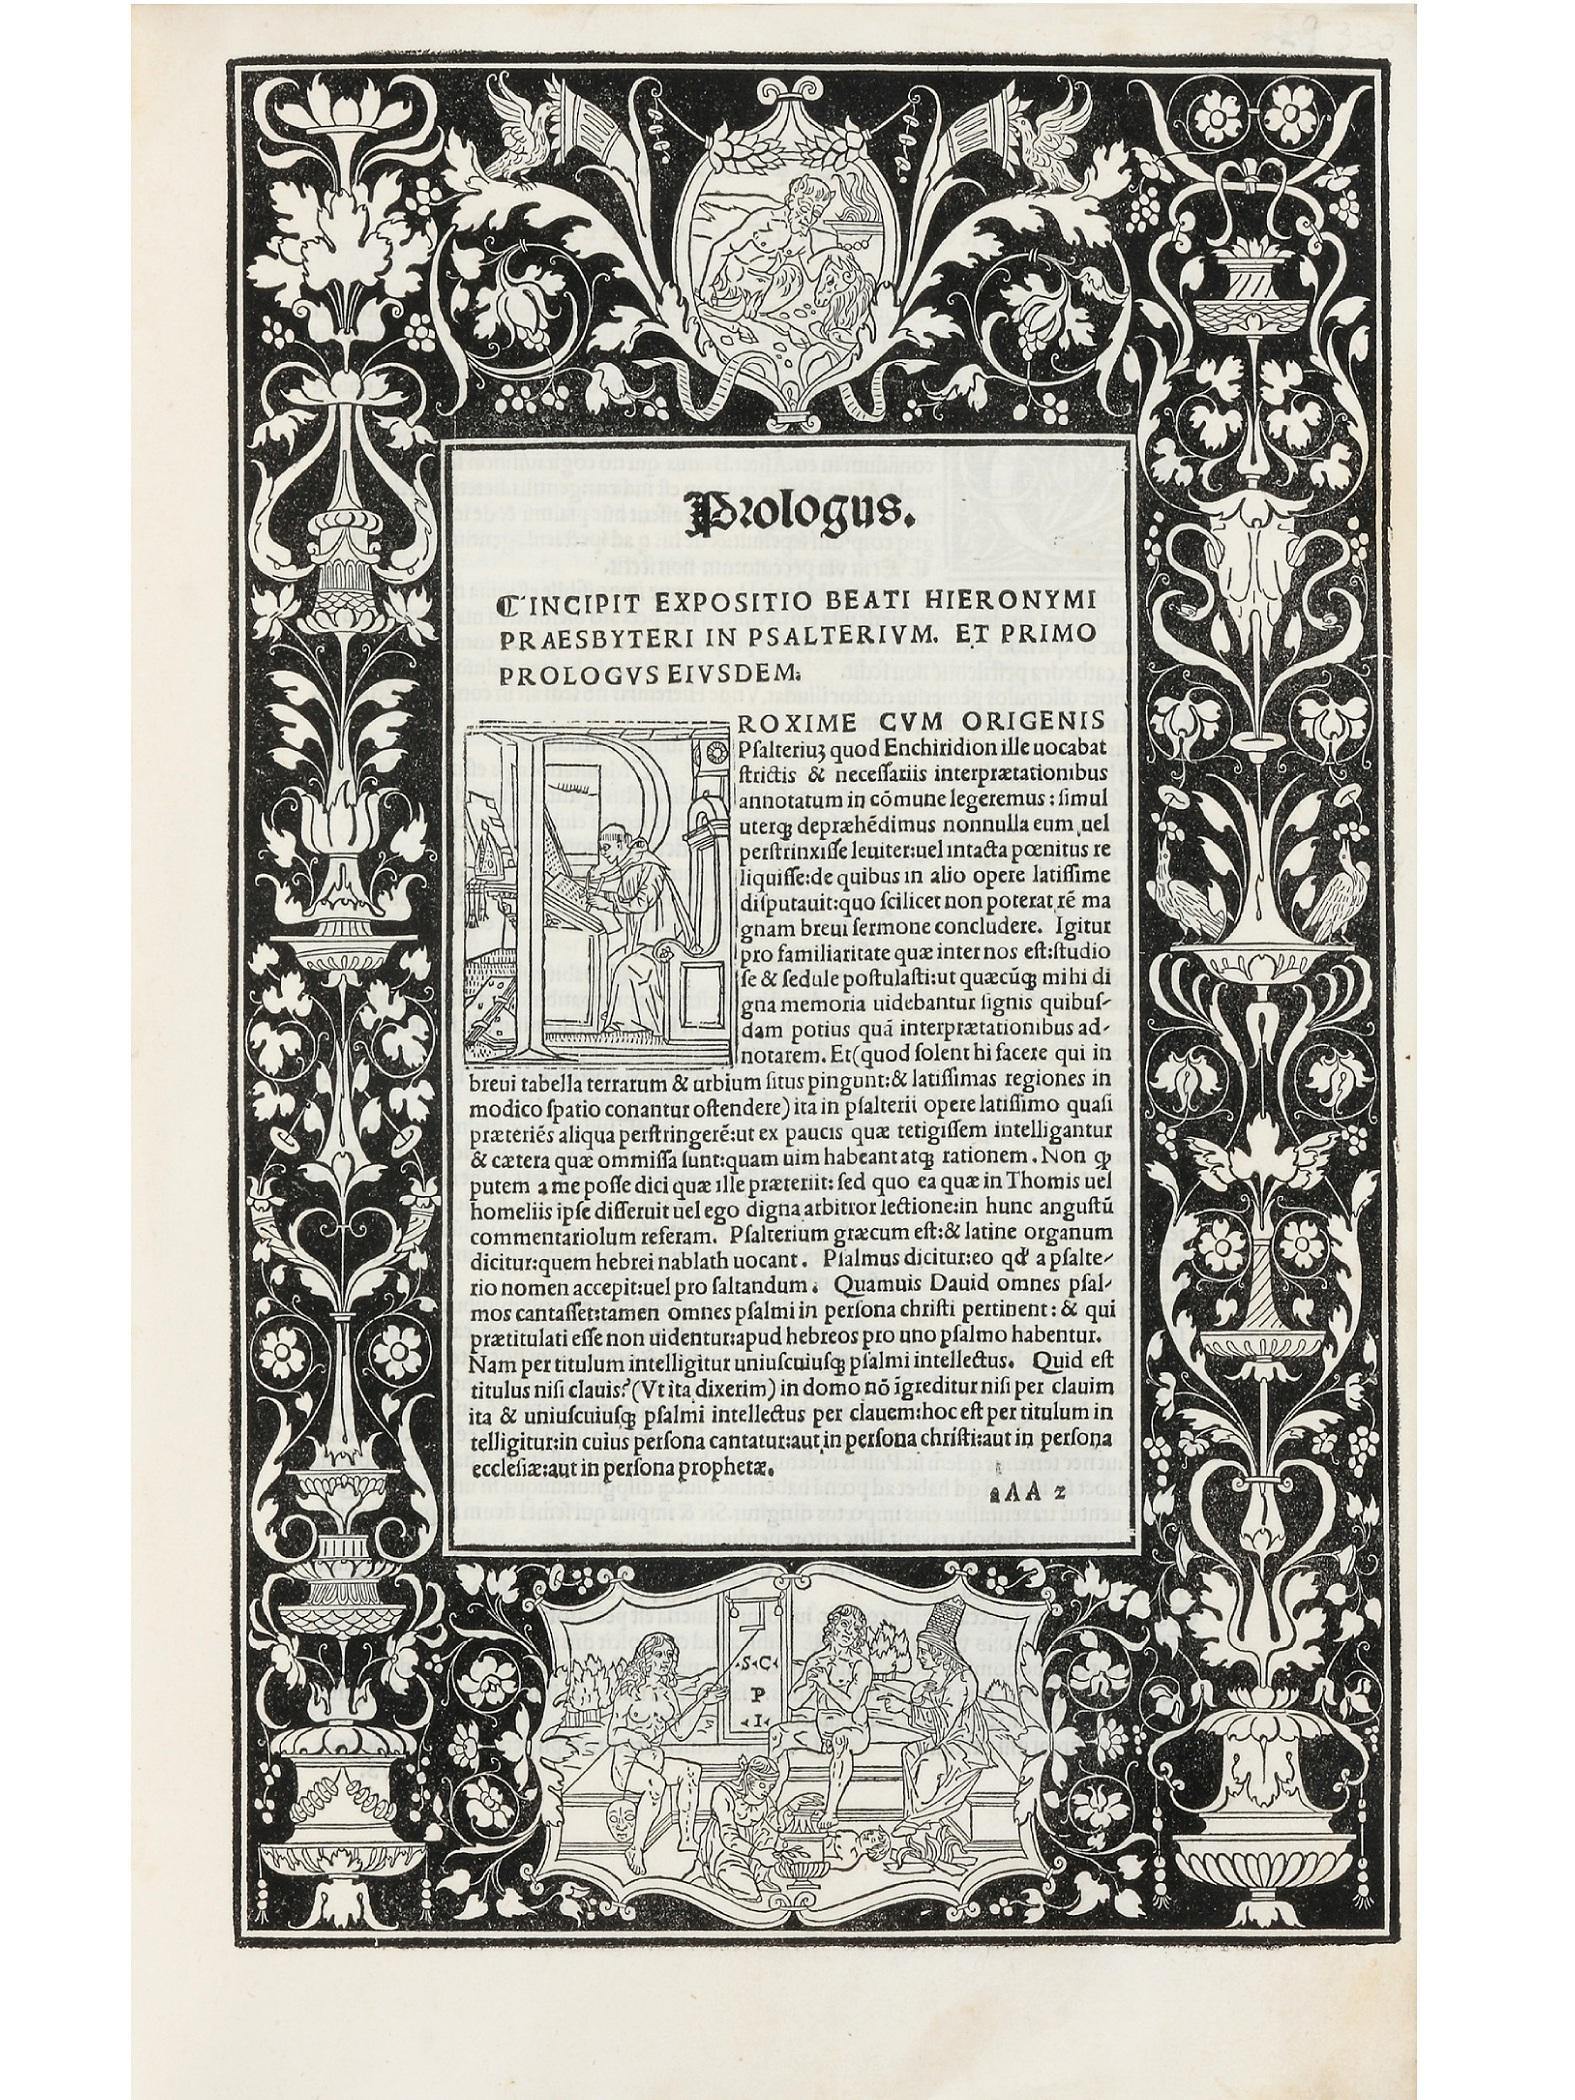 Hieronymus, Sophronius Eusebius (347-420).  Commentaria in Bibliam. Ed: Bernardinus Gadolus . Venice, Johannes and Gregorius de Gregoriis, de Forlivio, 1497 - 25 August 1498.